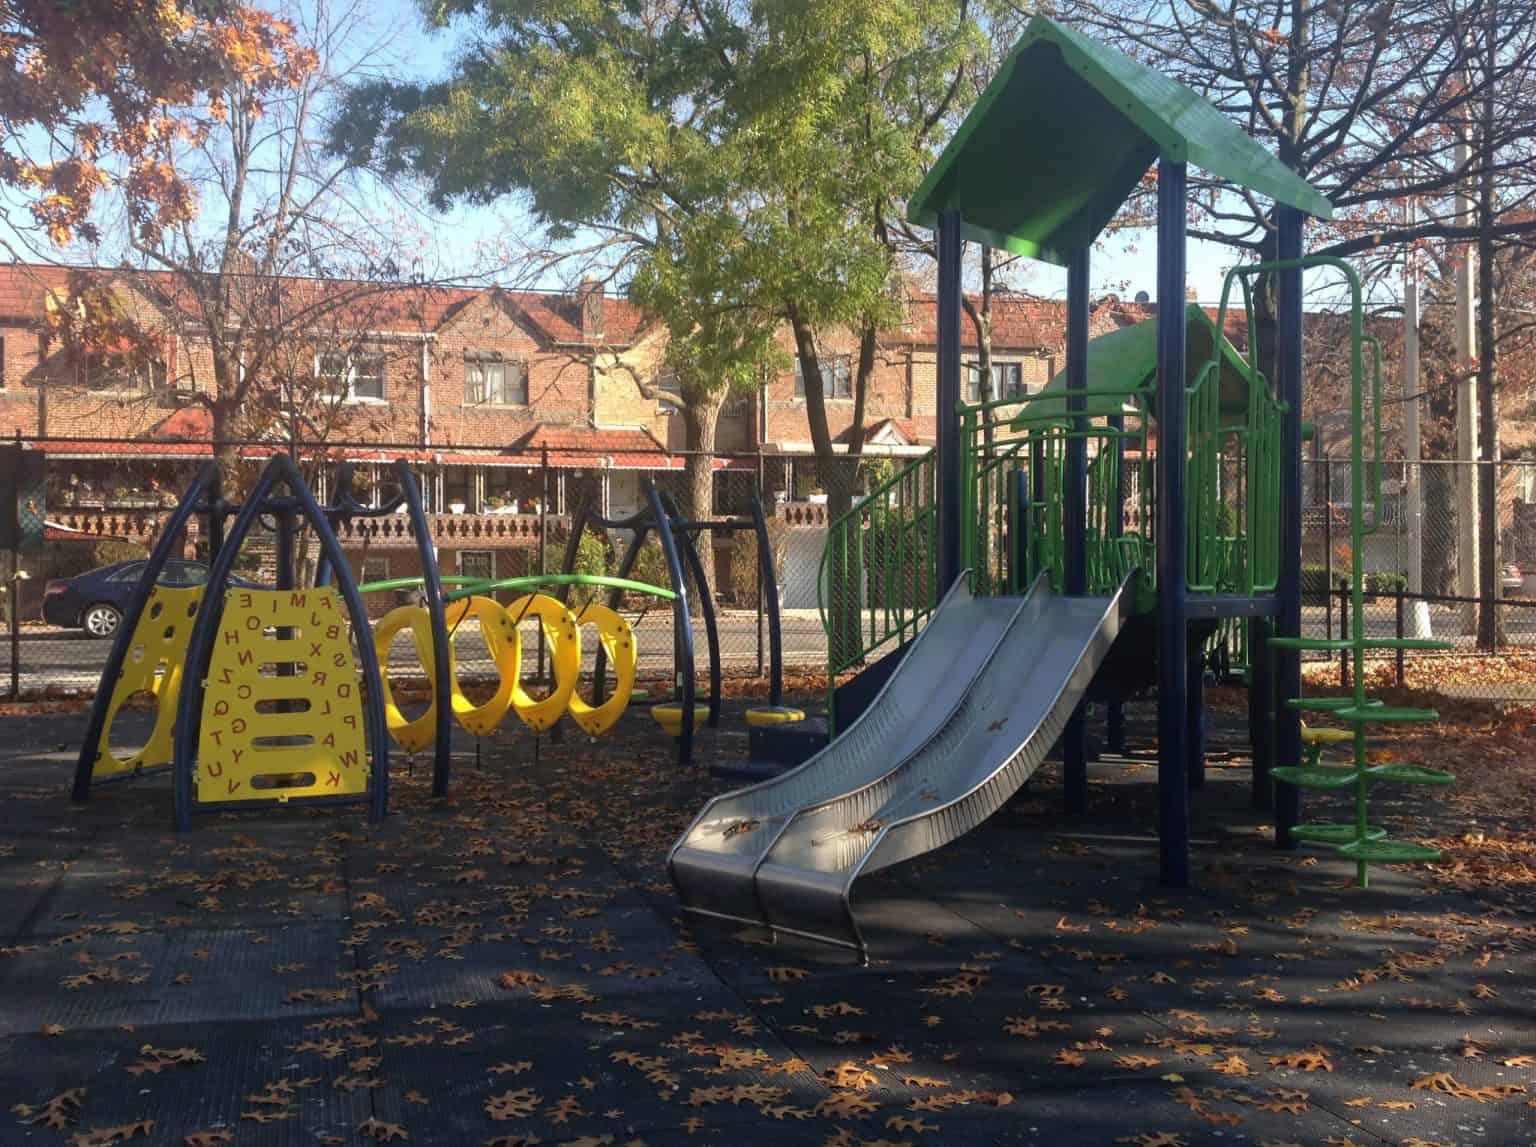 paerdegat-park-playground-brooklyn-ny_15931055971_o-scaled-e1587681173883-1536x1147